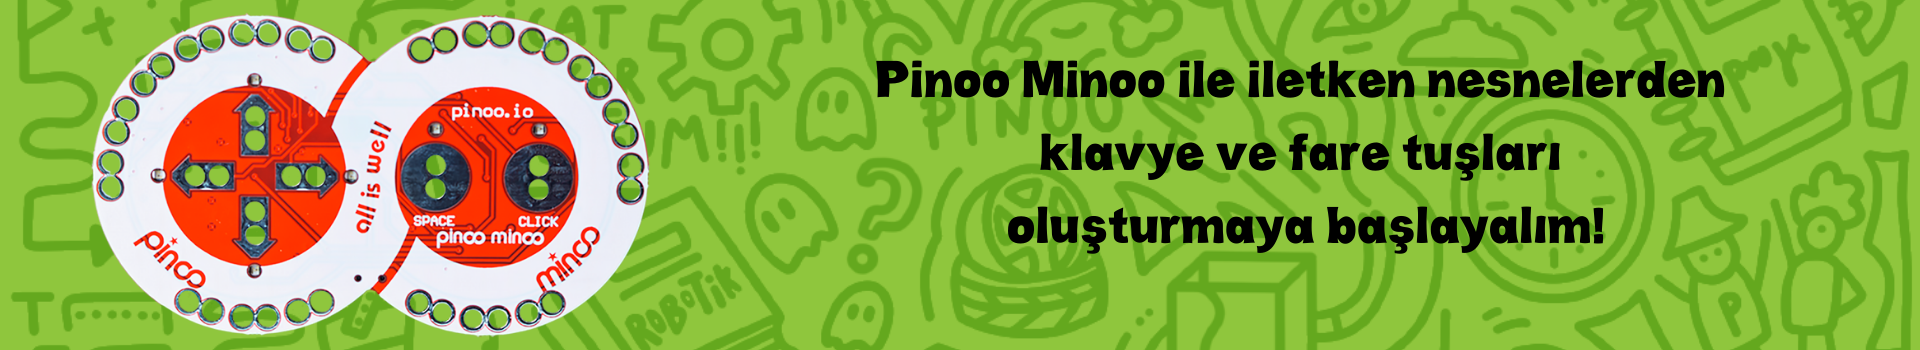 Pinoo Minoo